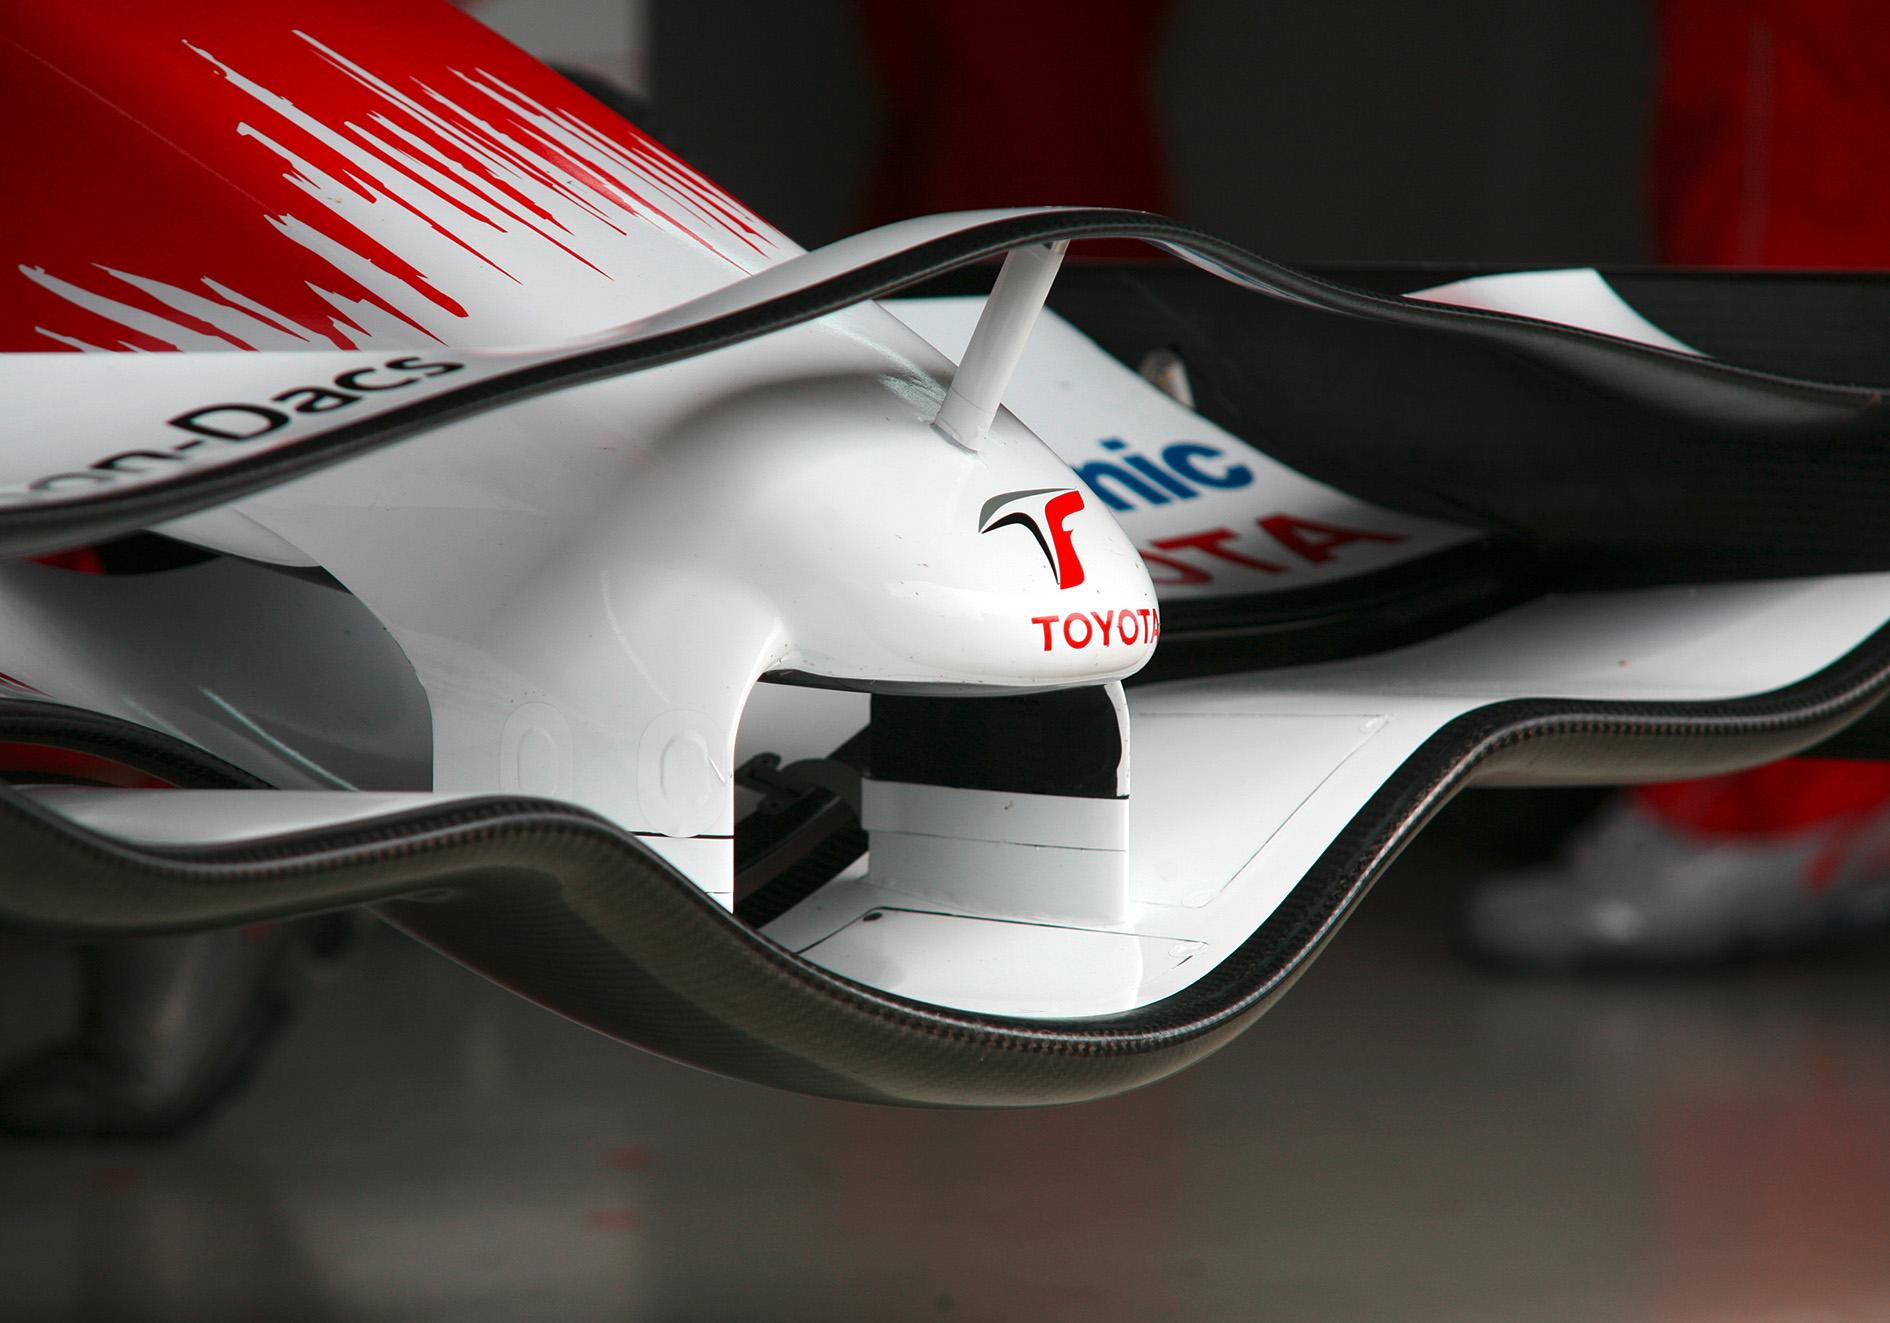 17_Josekdesign_Toyota_F1_Fotografie.jpg